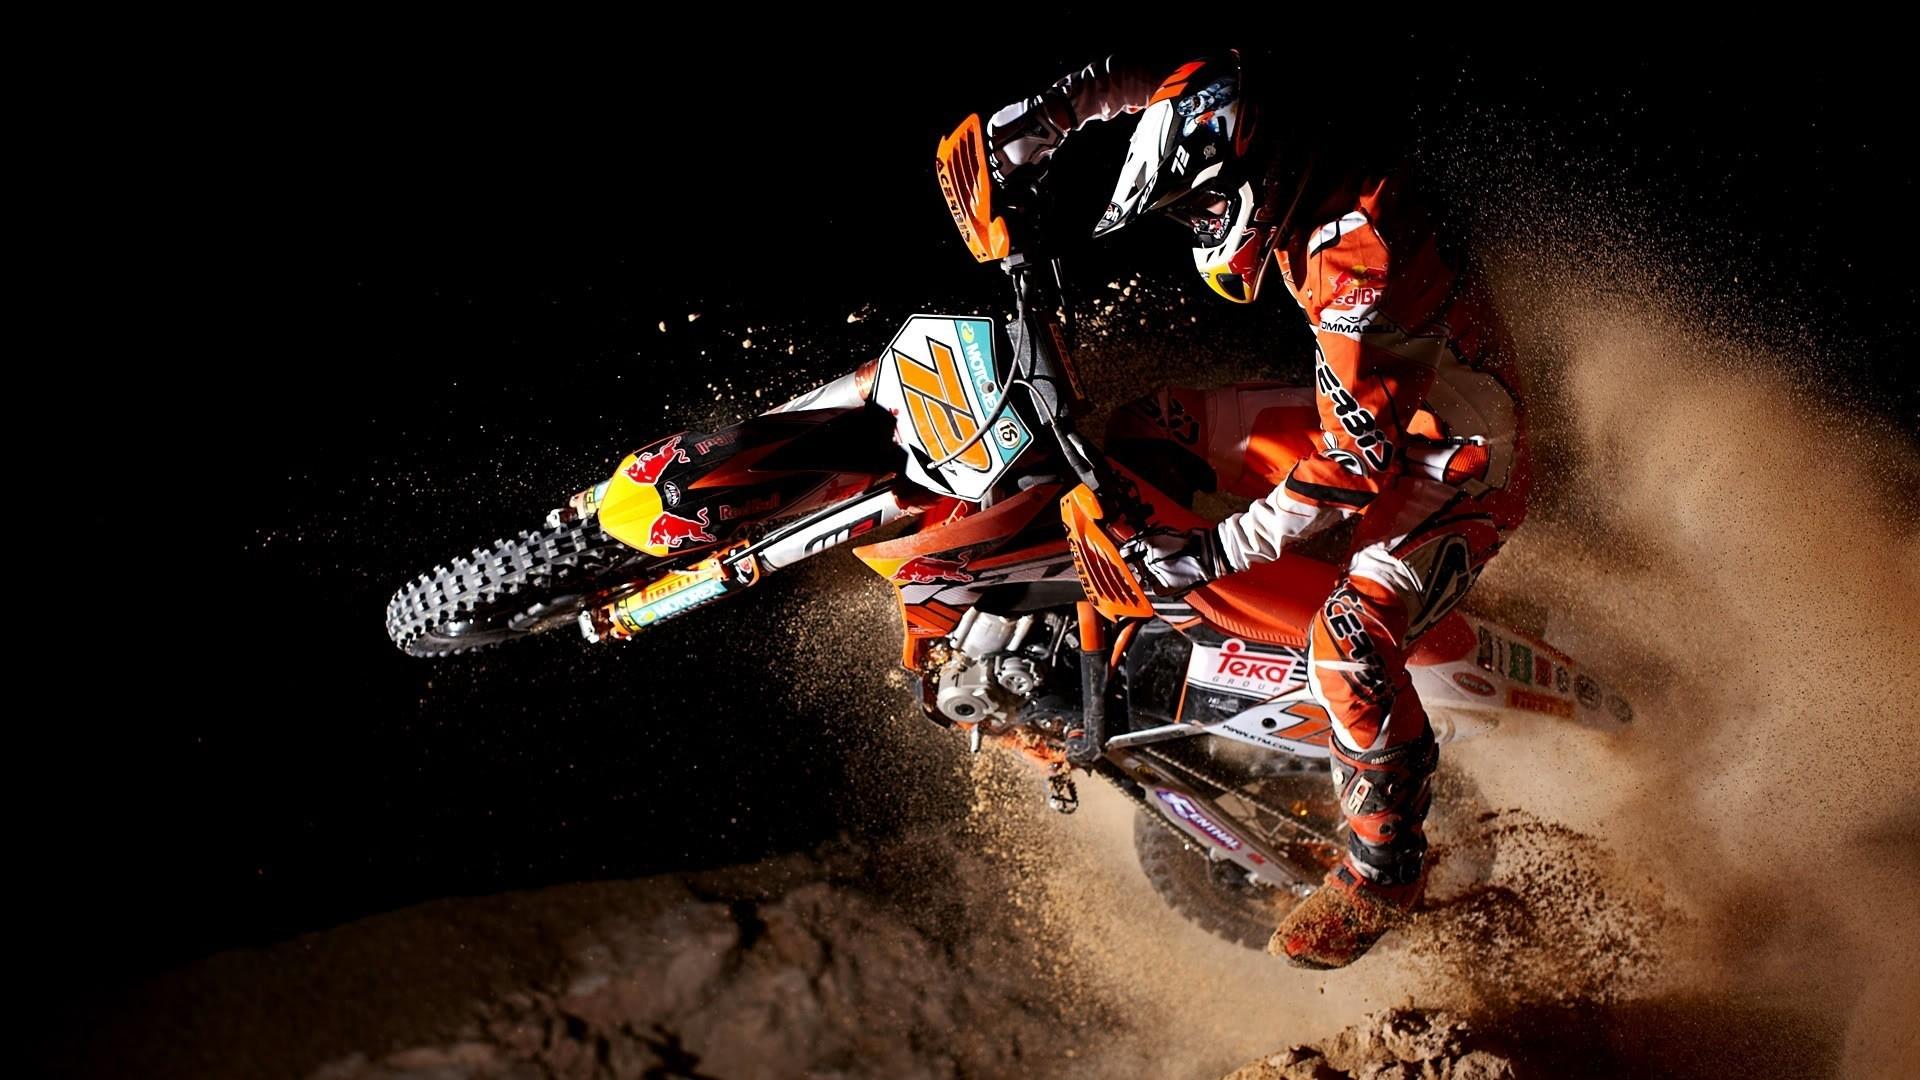 Kawasaki Dirt Bikes Wallpaper. Ktm Motocross Fighters Games Red Bull  Wallpaper #133796 – Resolution px